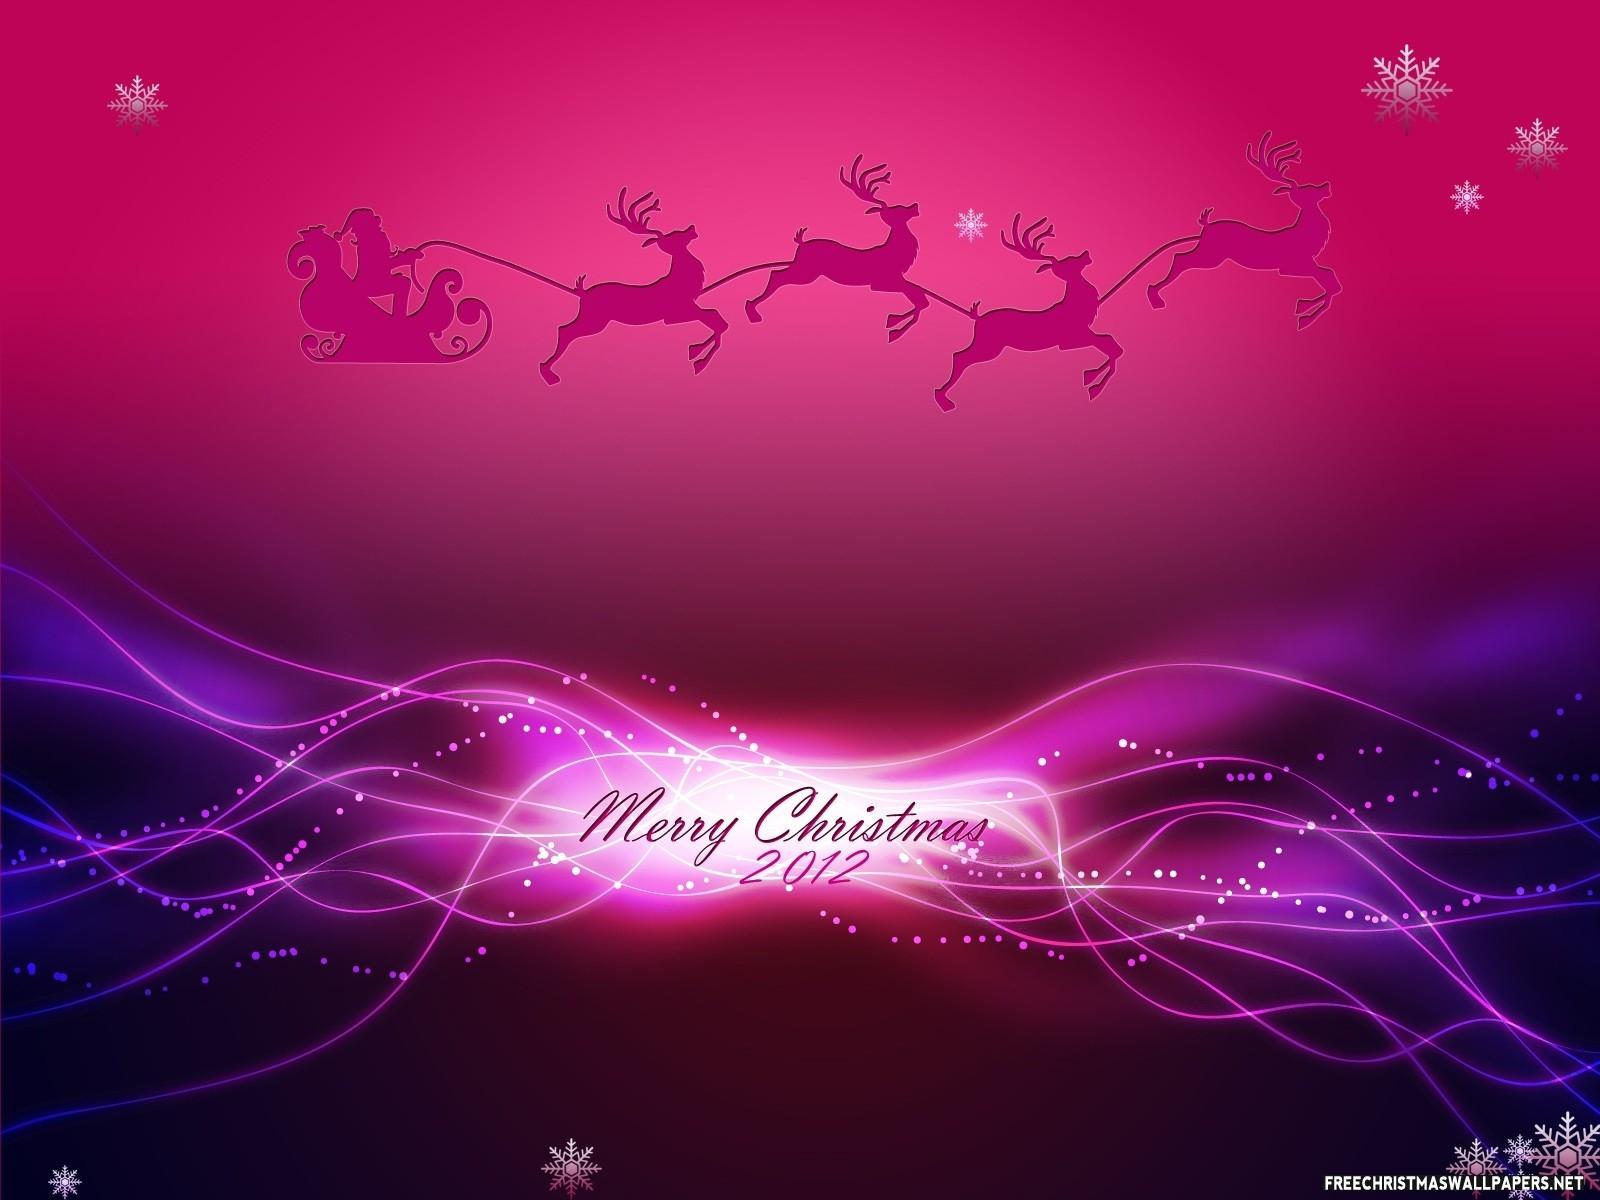 http://3.bp.blogspot.com/-vm4H0v0KwrY/TuaH41CfXcI/AAAAAAAADf4/l_Gf9Ar50N4/s1600-d/Merry.Christmas.5.jpg